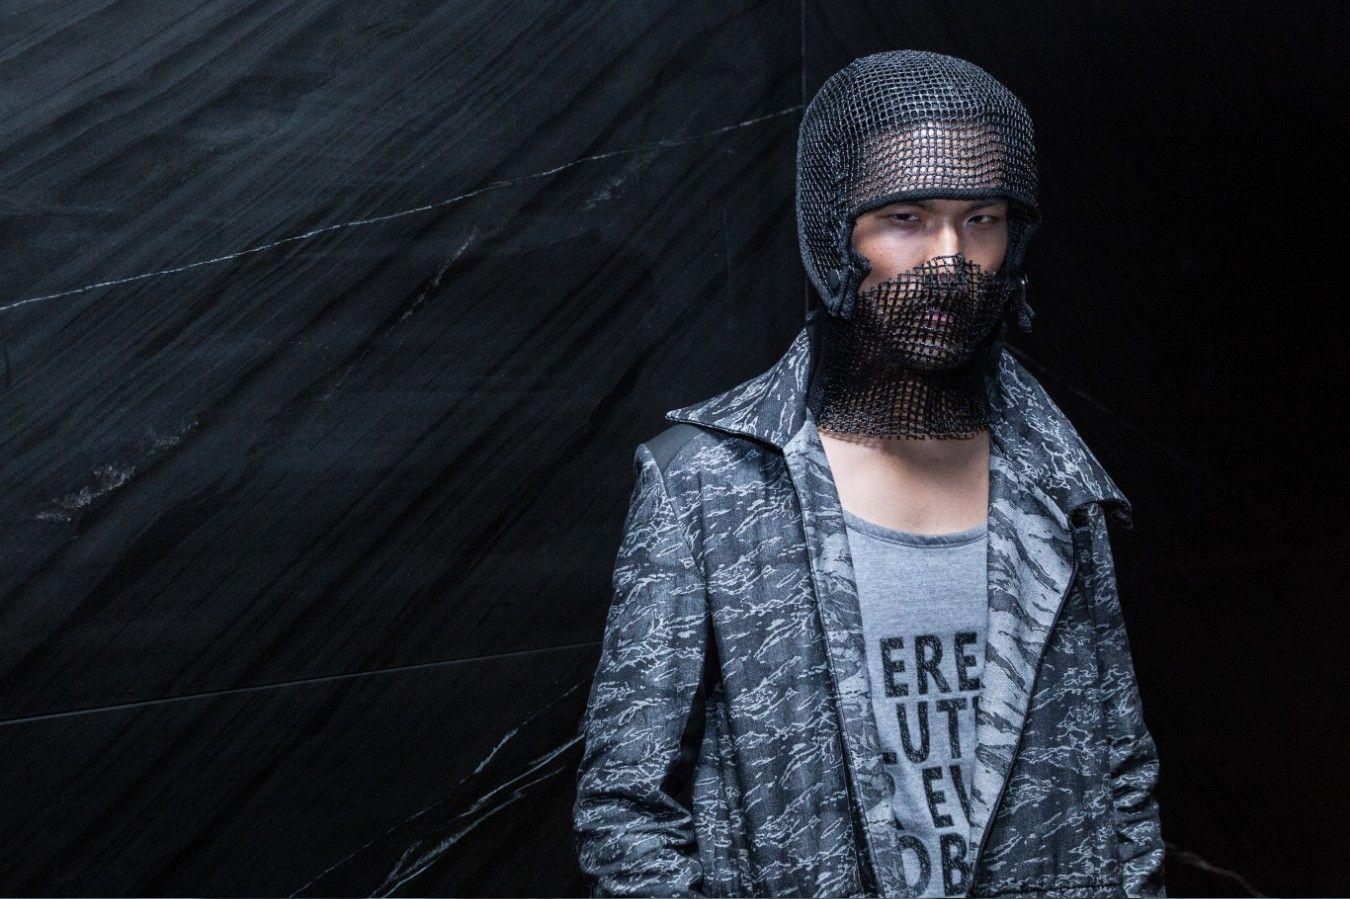 Men's folio Designer of the year 2015 Awarded Most Promising Designer Award Theme: Stop violence Photographer: @amyboyy #menswear #fashiondesign